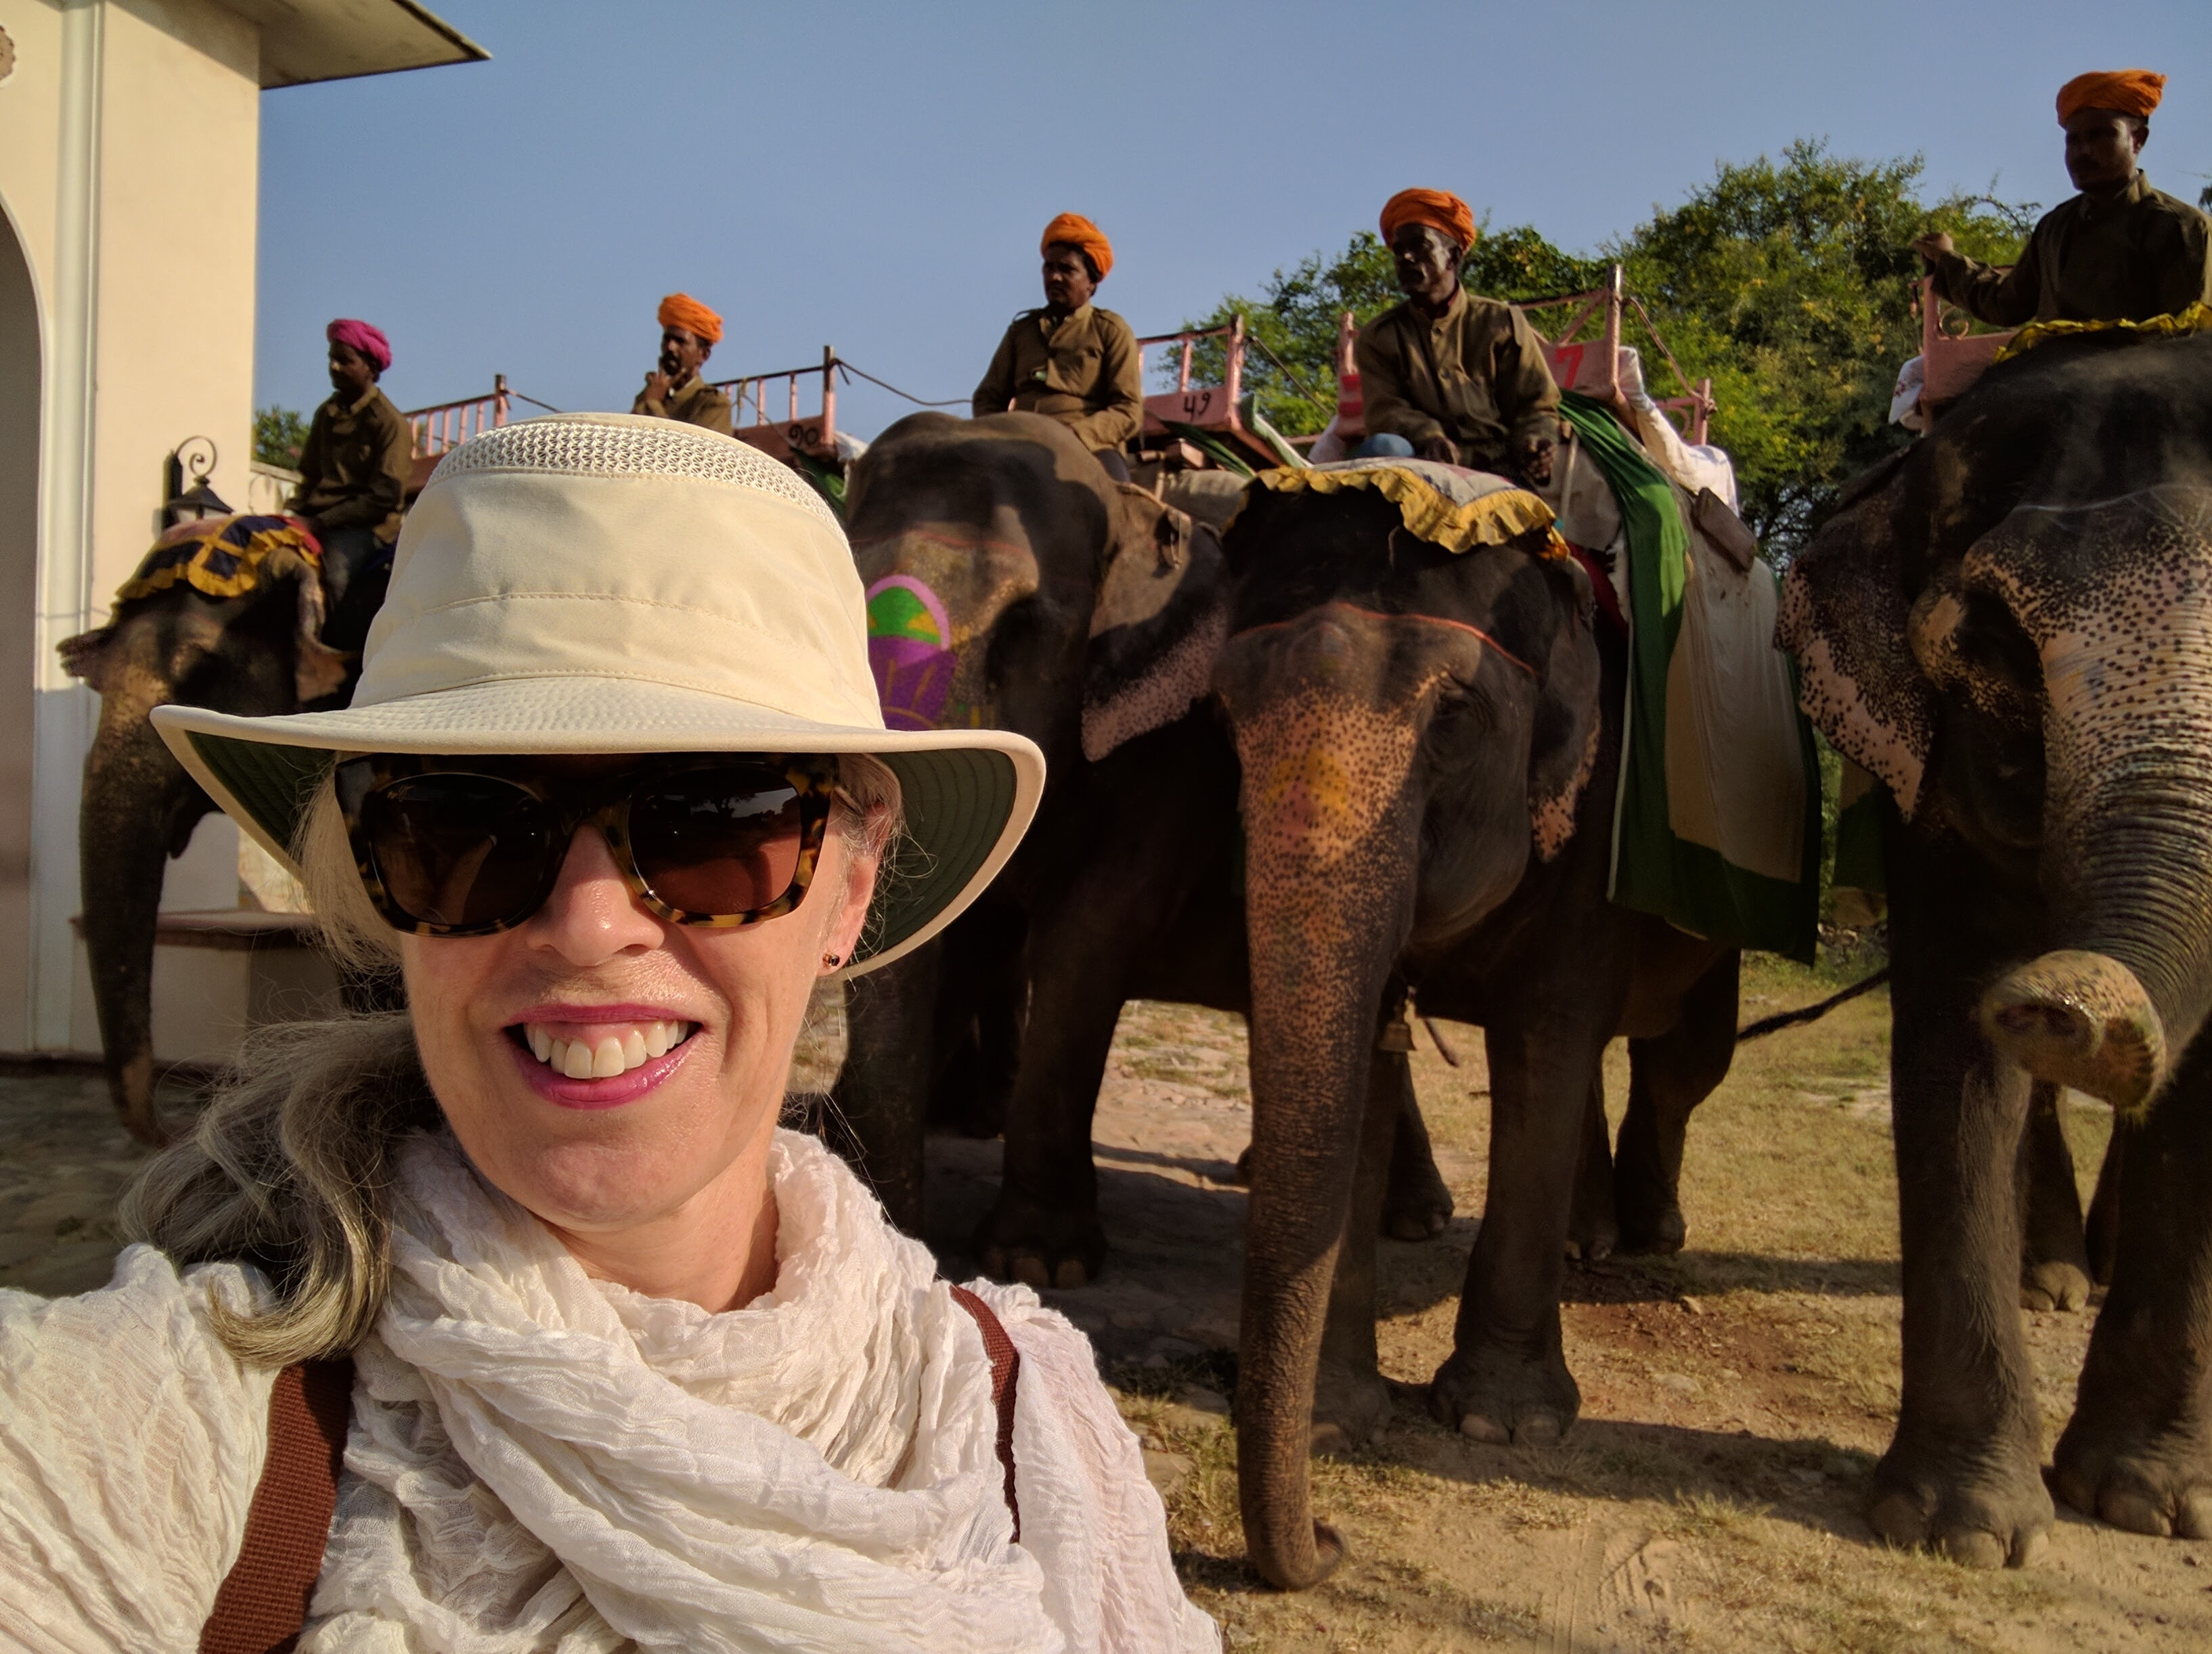 Exploring India (photo courtesy of Dallyce Macas)